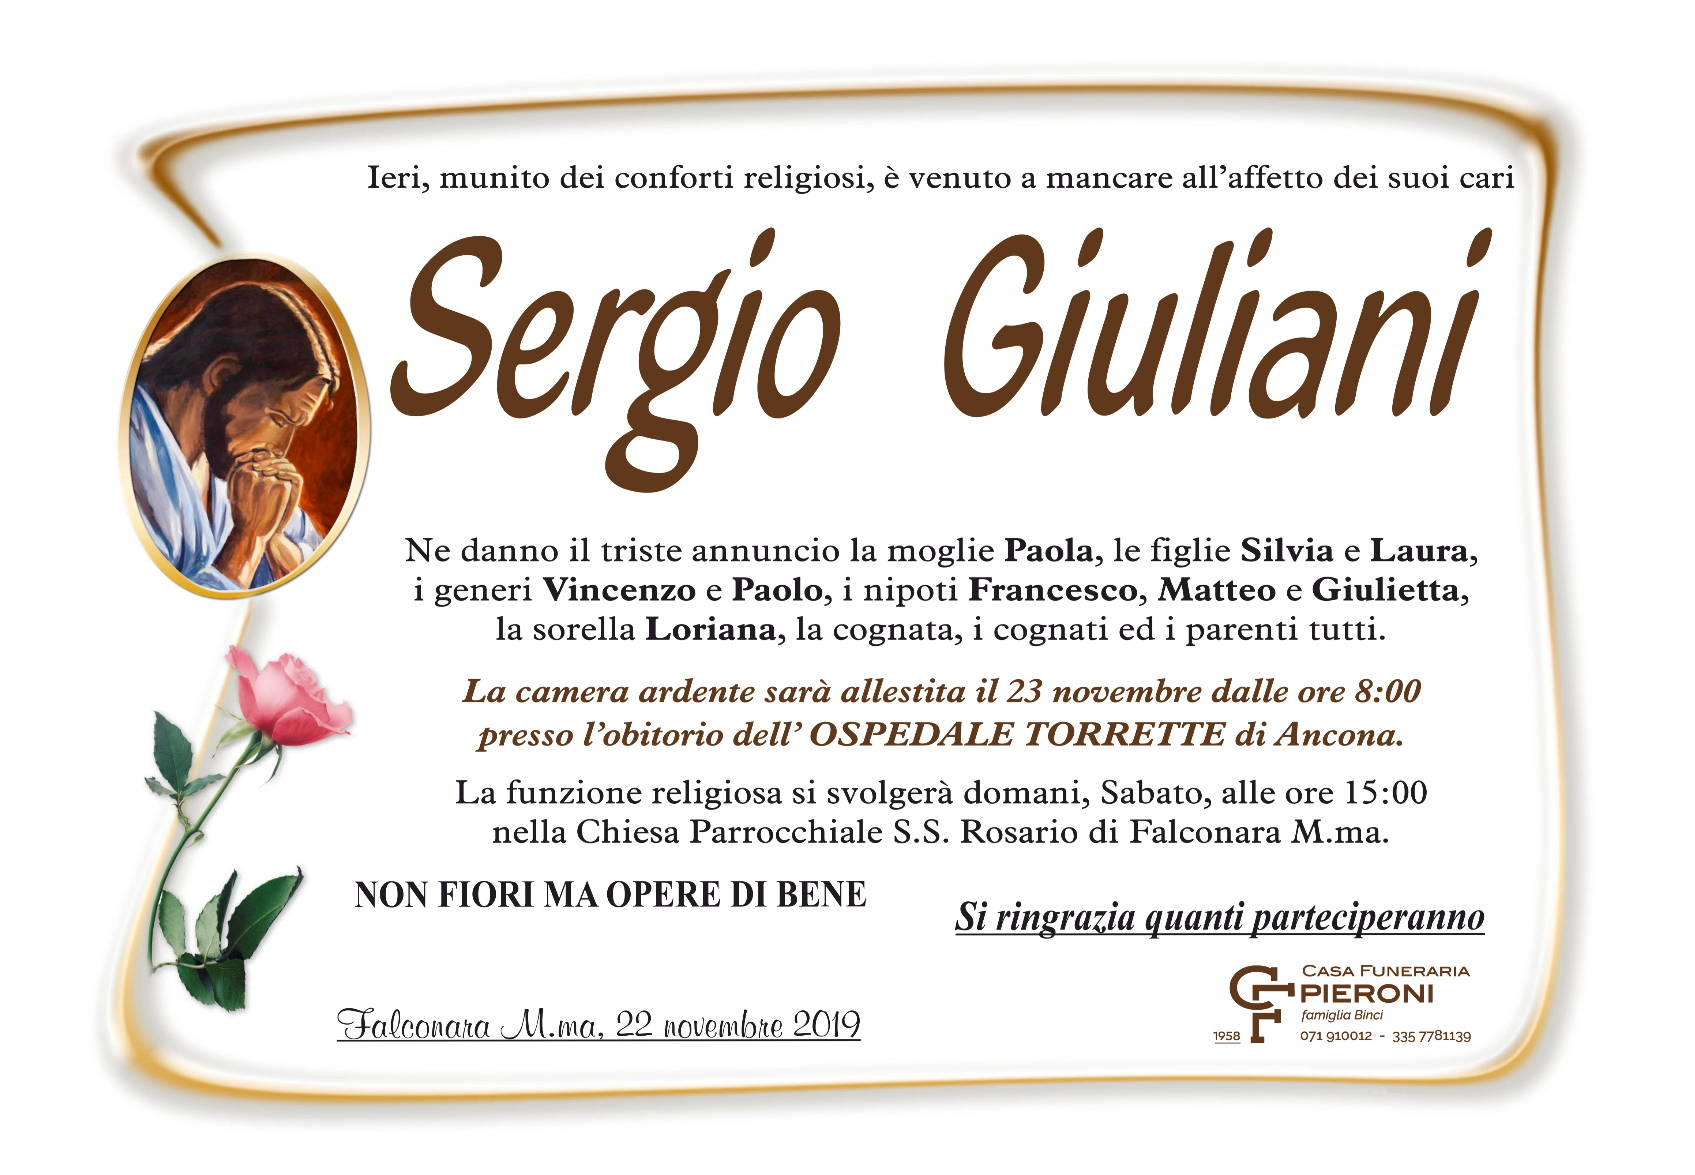 Sergio Giuliani